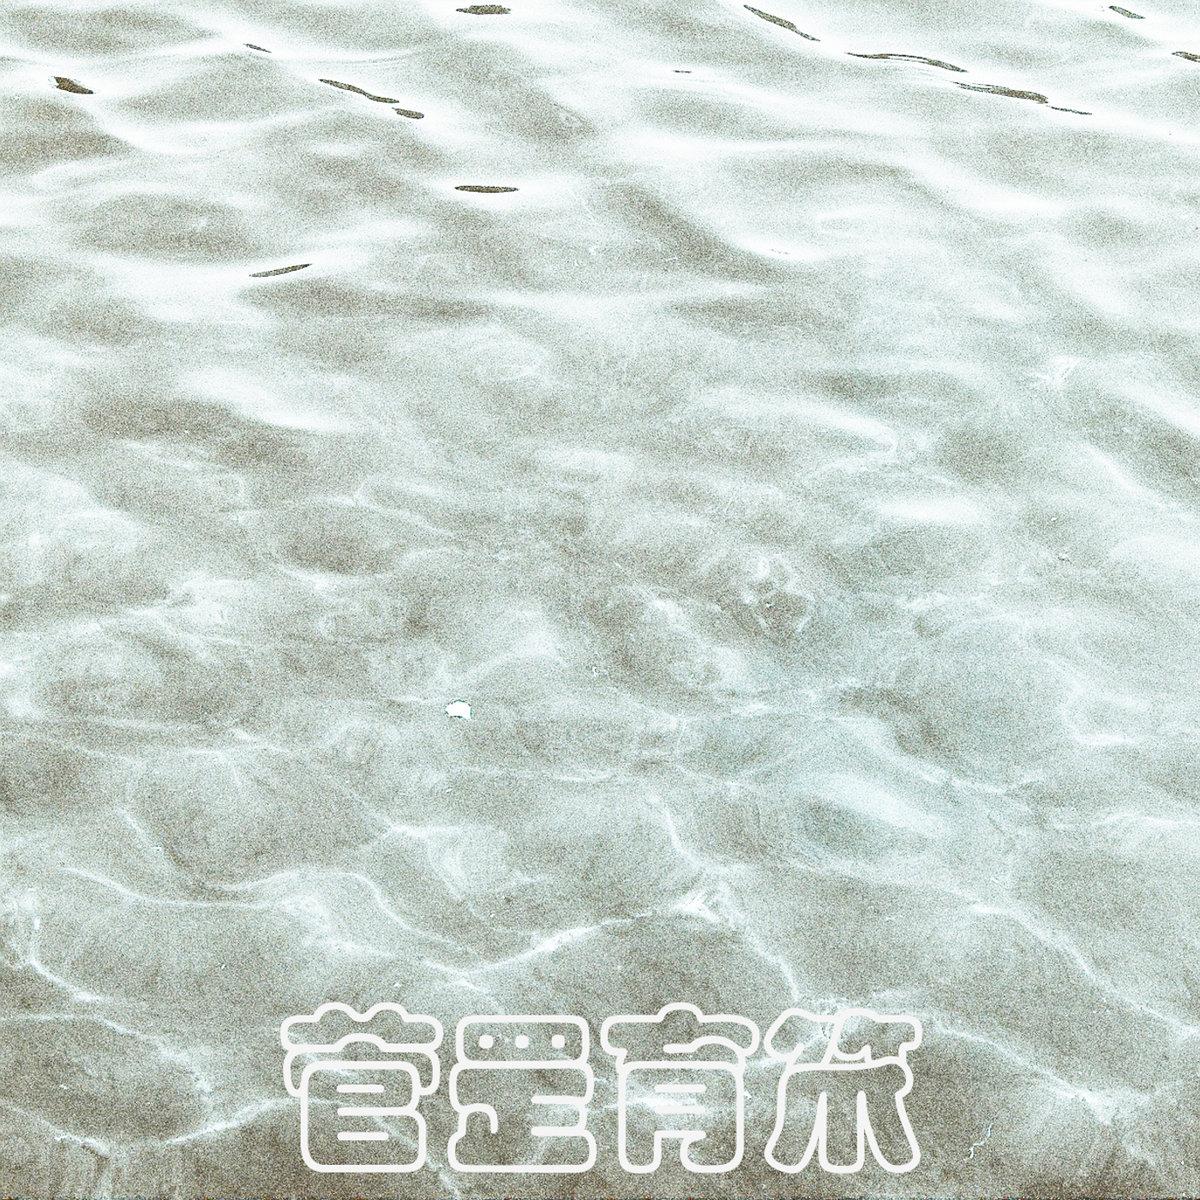 Beam cover